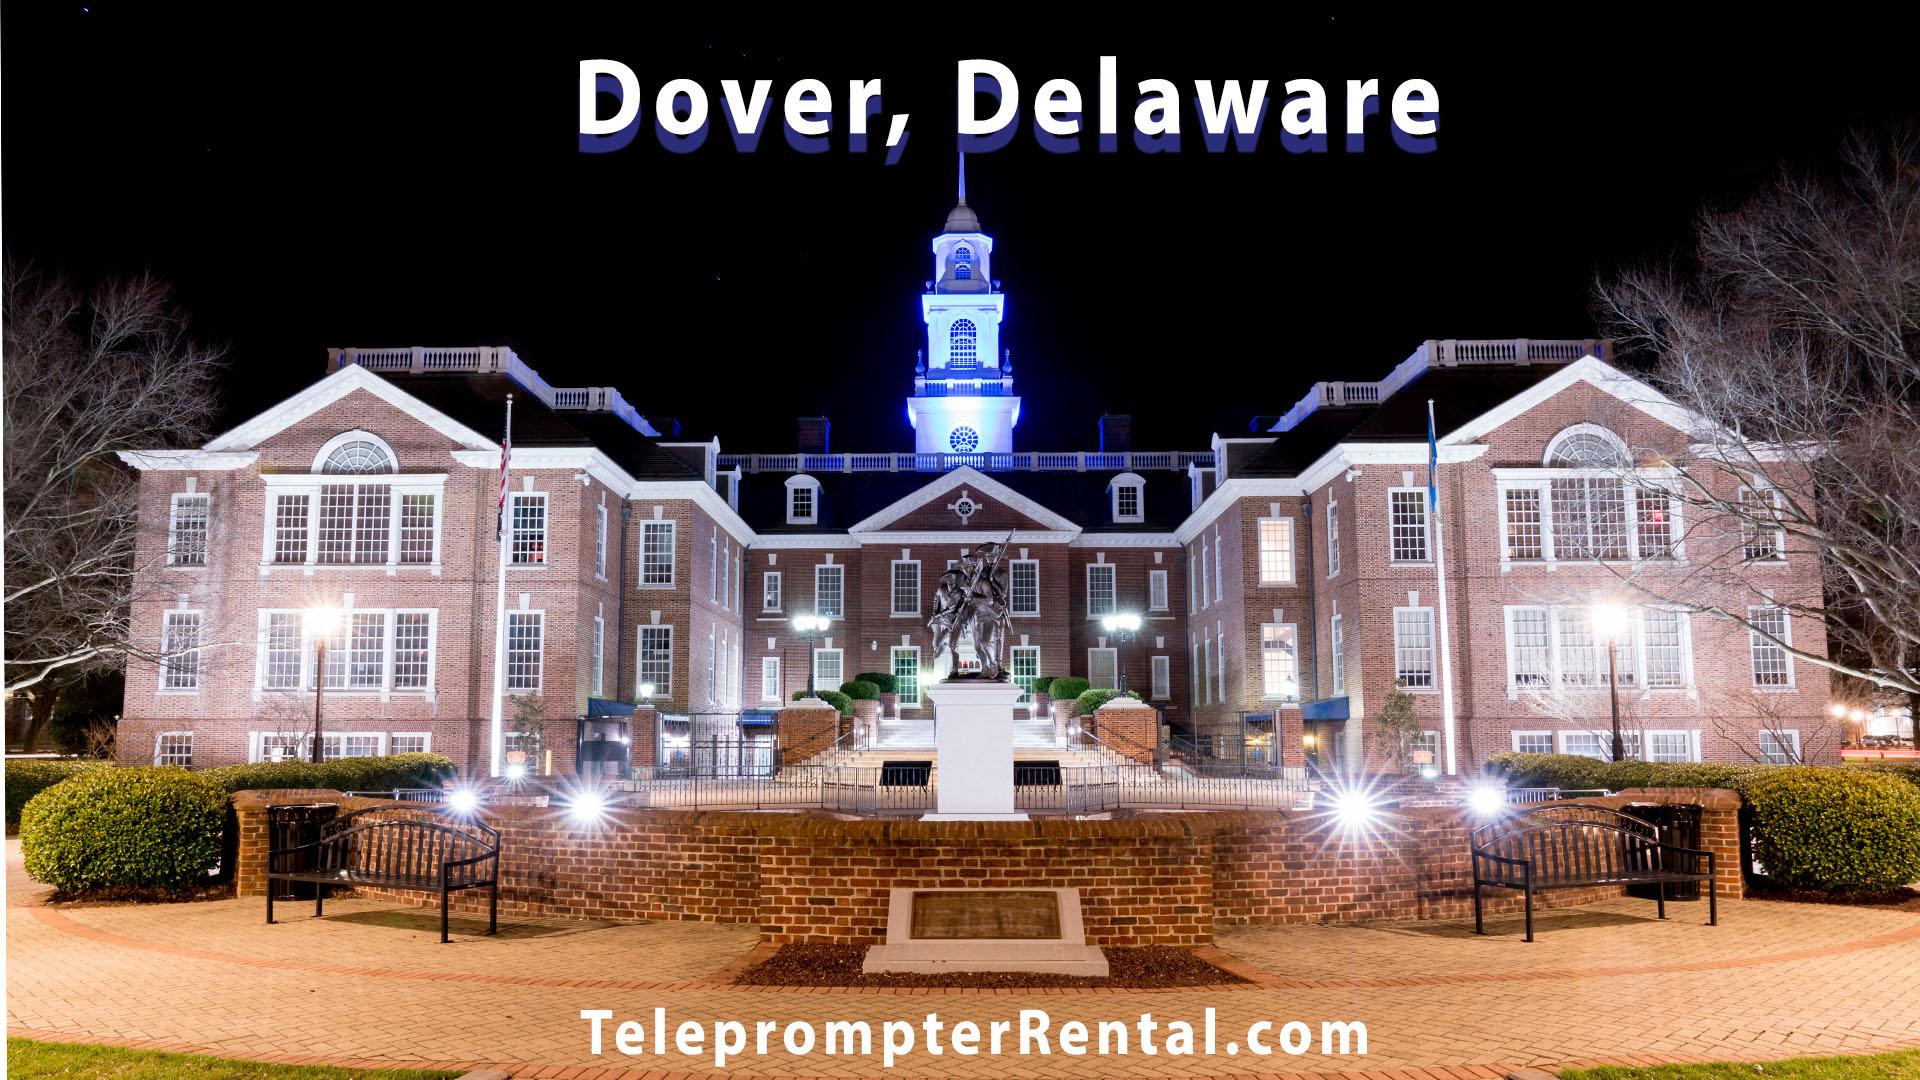 Dover Delaware - Teleprompter Rental